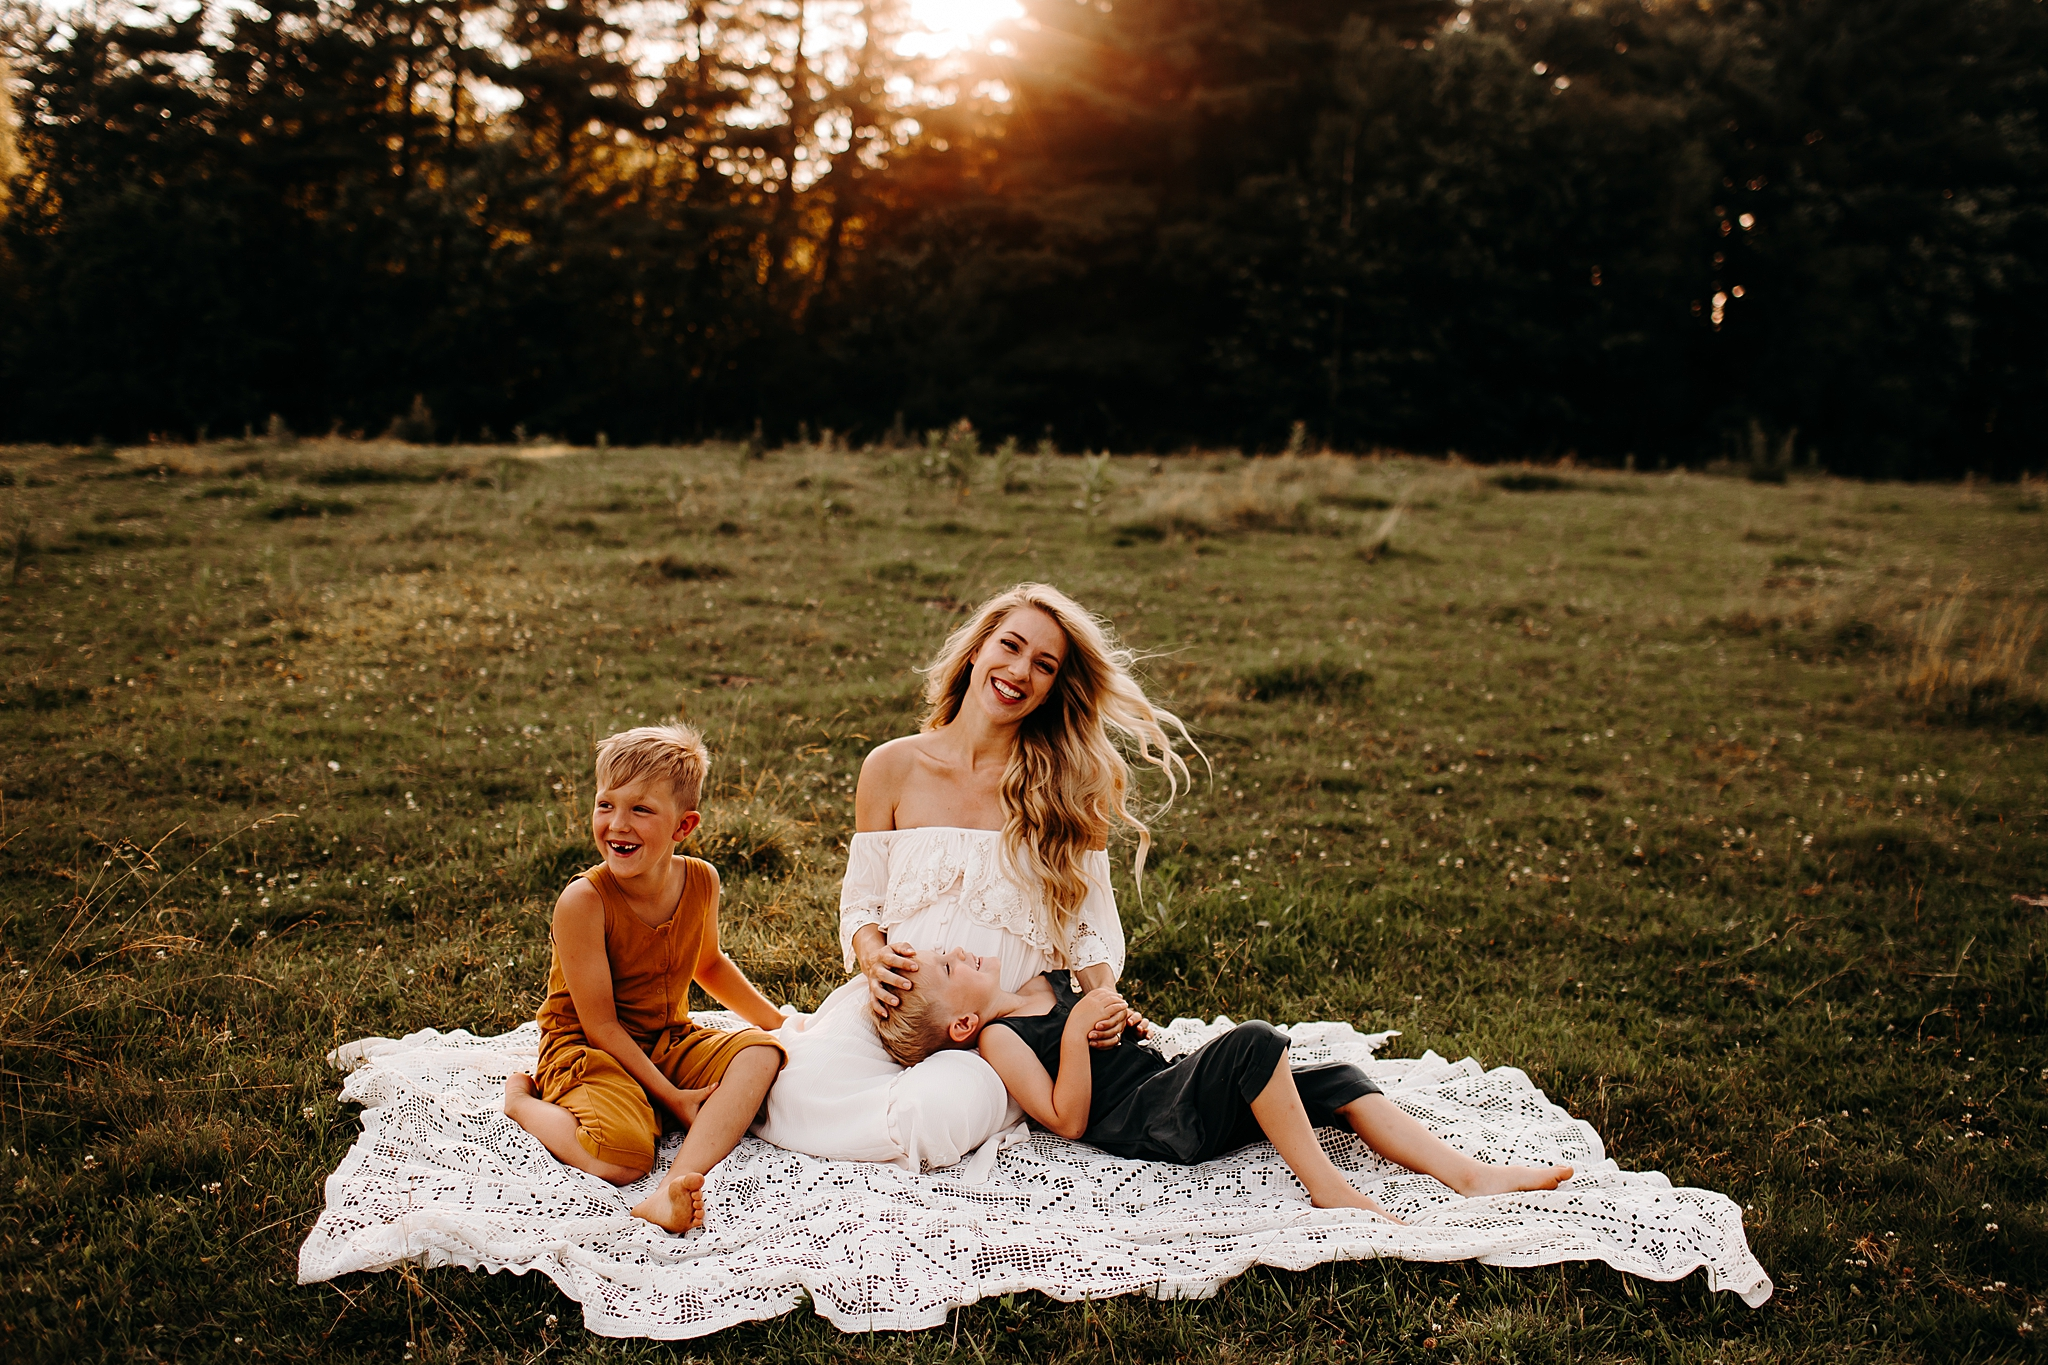 Emily-San-Antonio-Family-Photographer00066_WEB.jpg